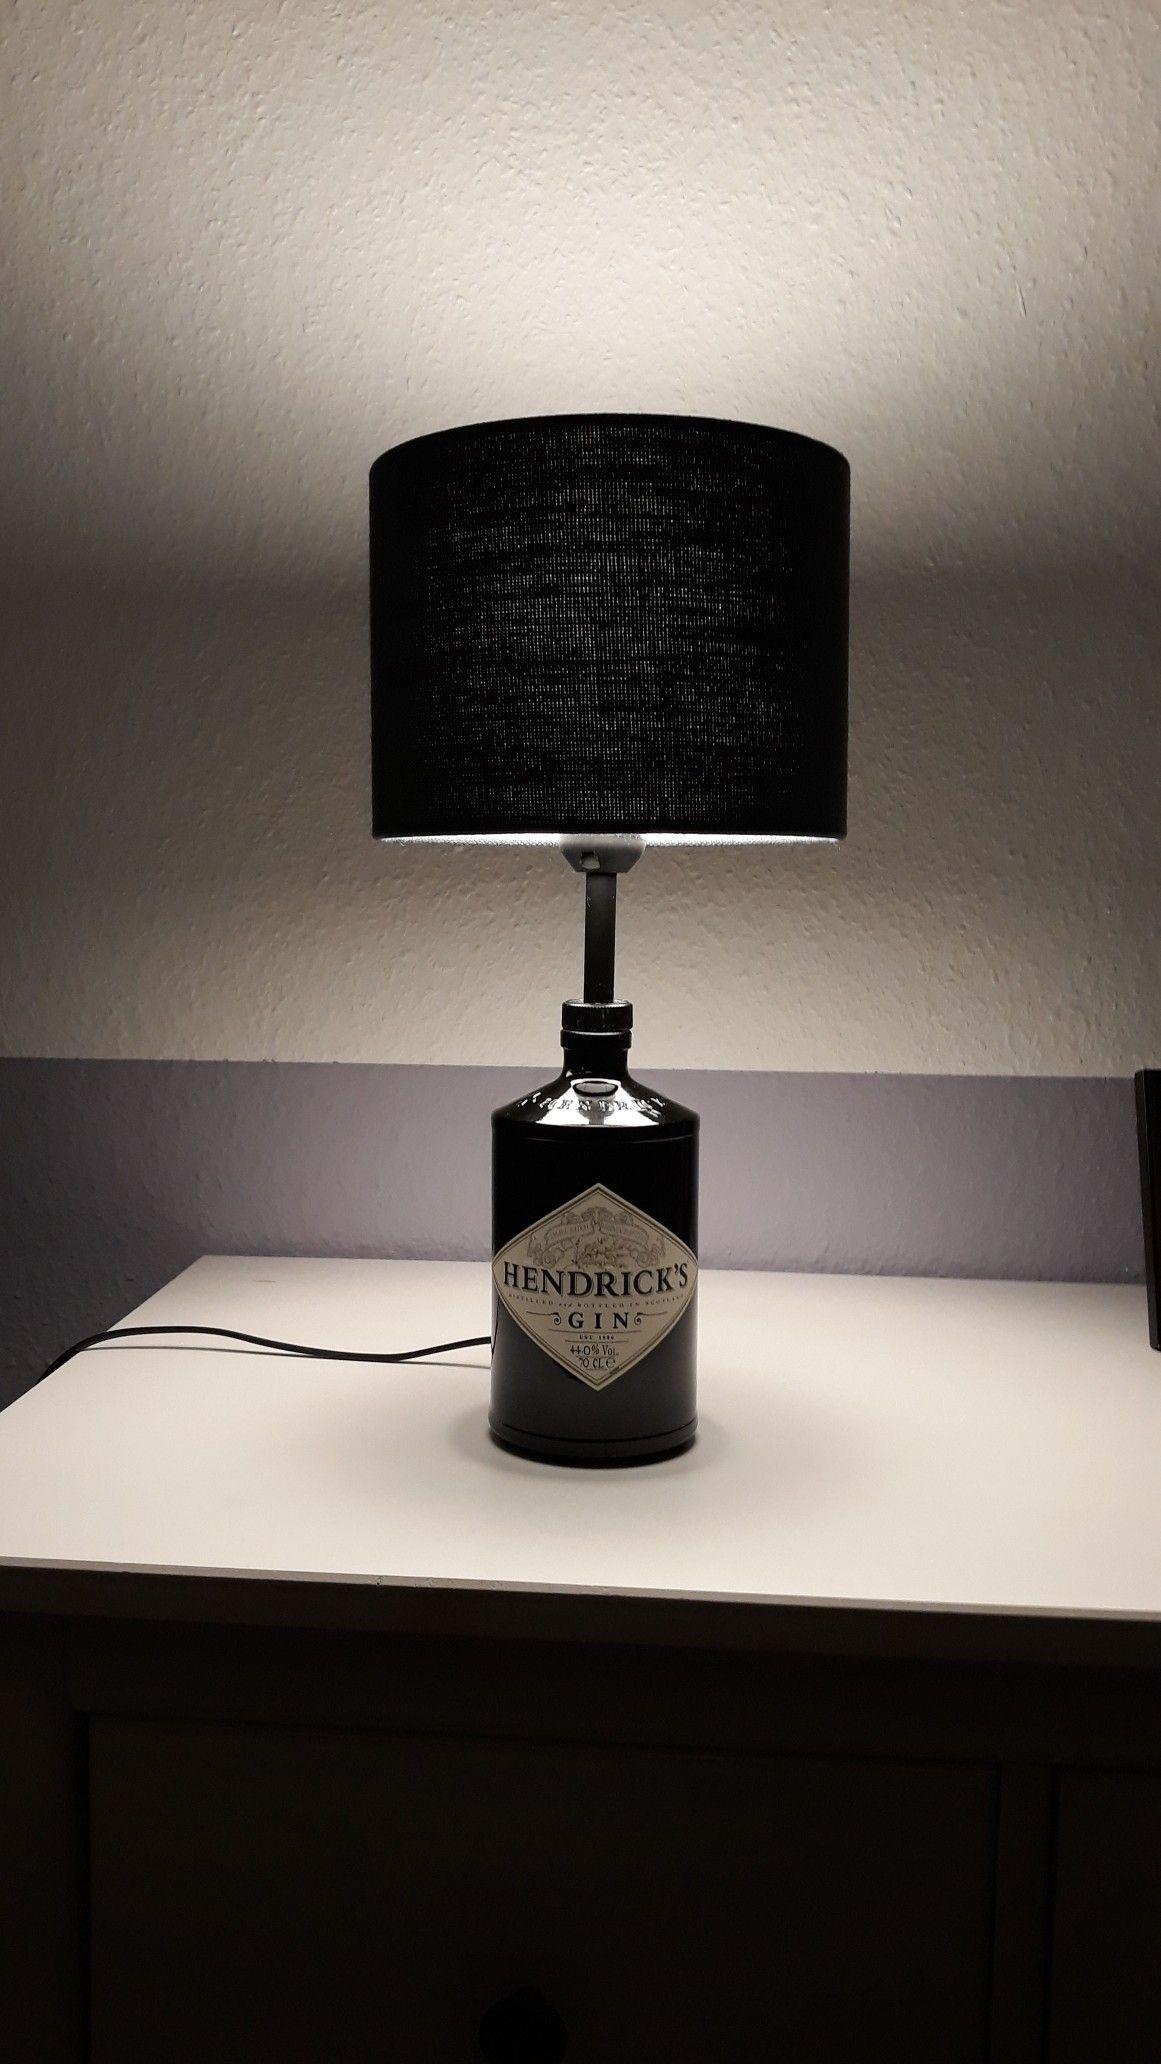 gin lampe ikea lampen lampe design